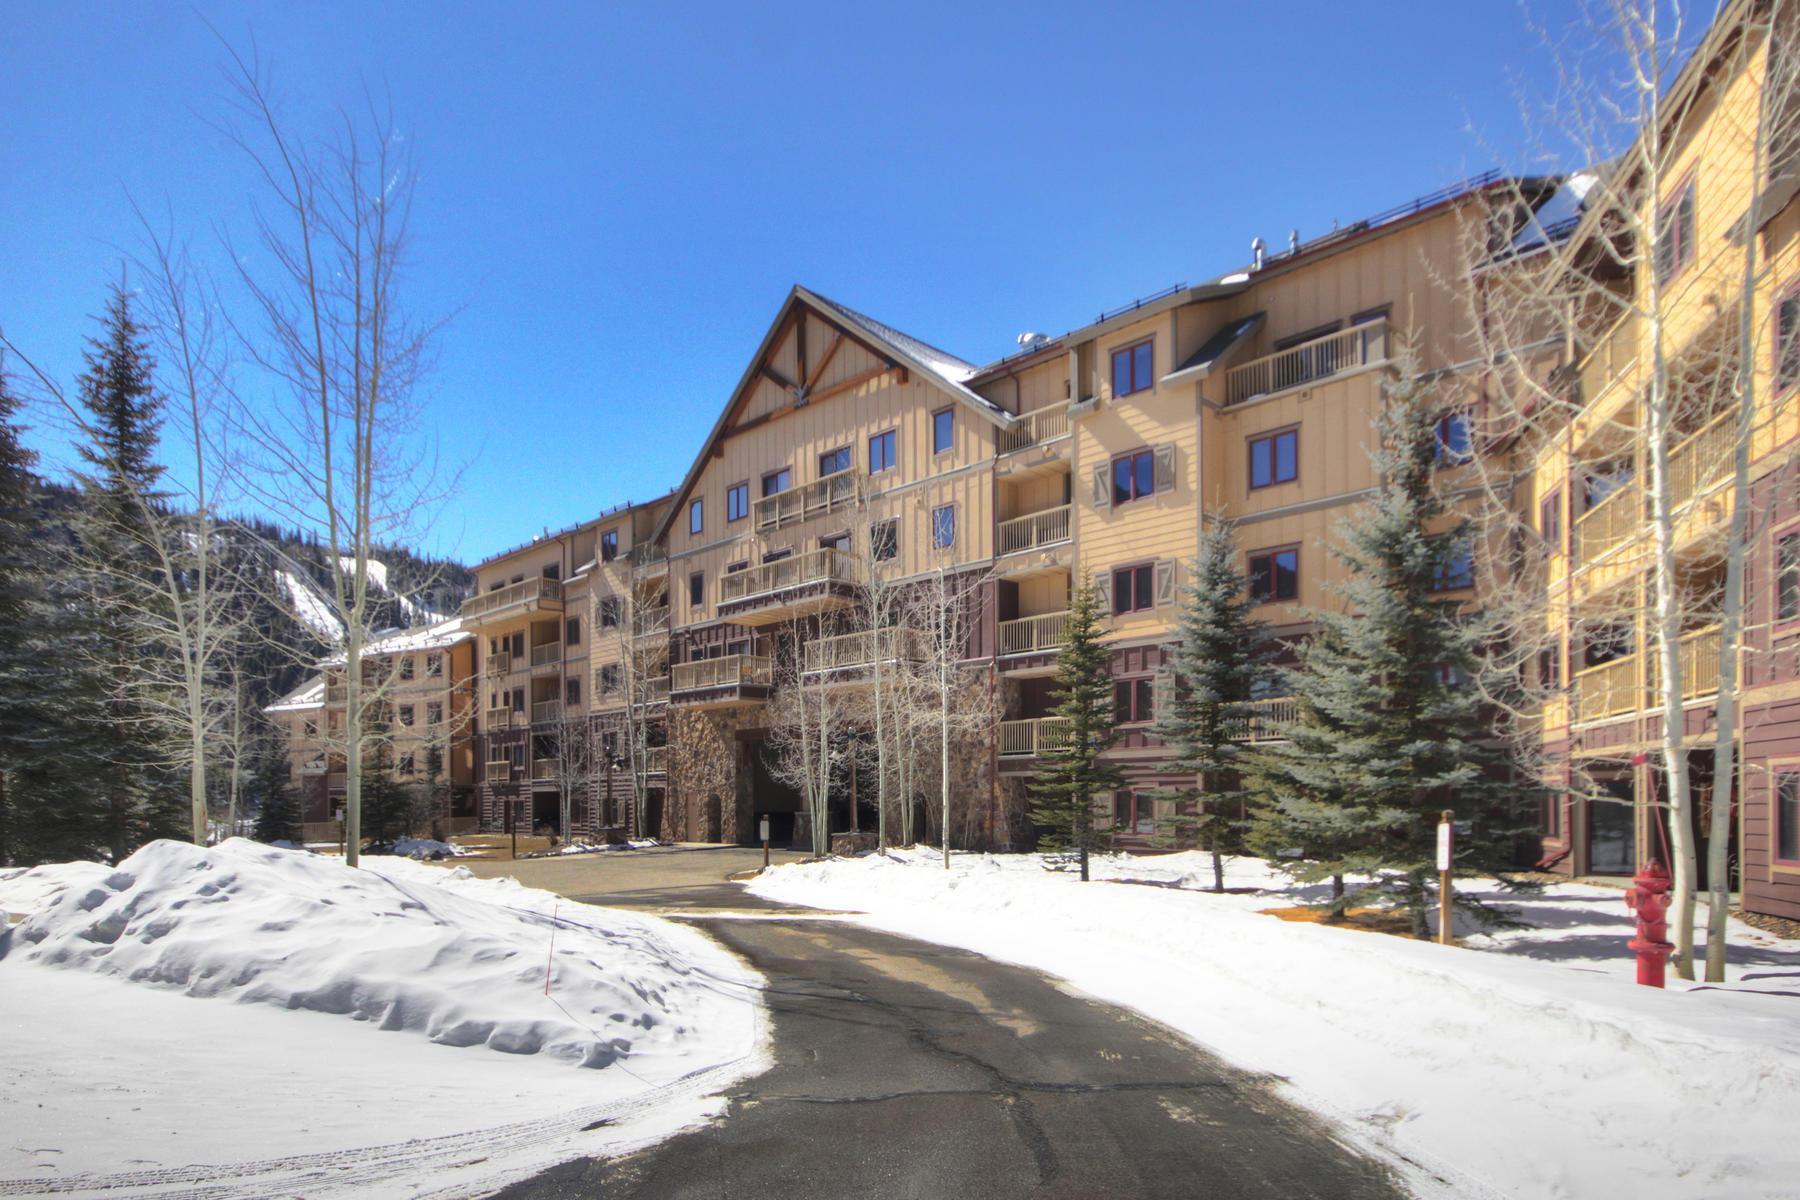 Red Hawk Lodge #2214 20 Hunkidori Court #2214 Keystone, Colorado 80435 États-Unis